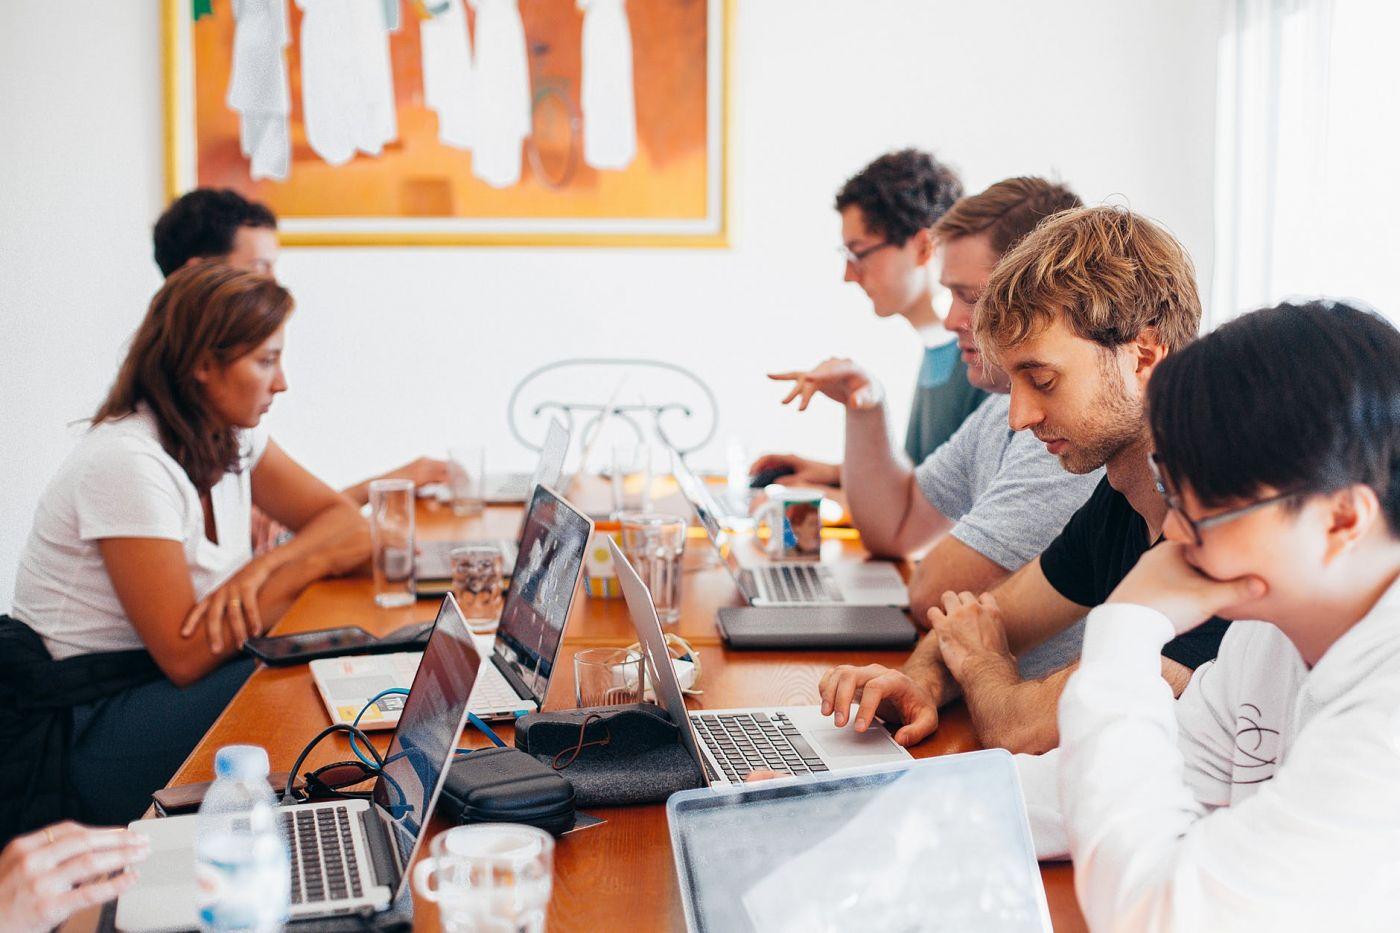 Conceito Governanca Para Startups - Auster Inteligência Contábil